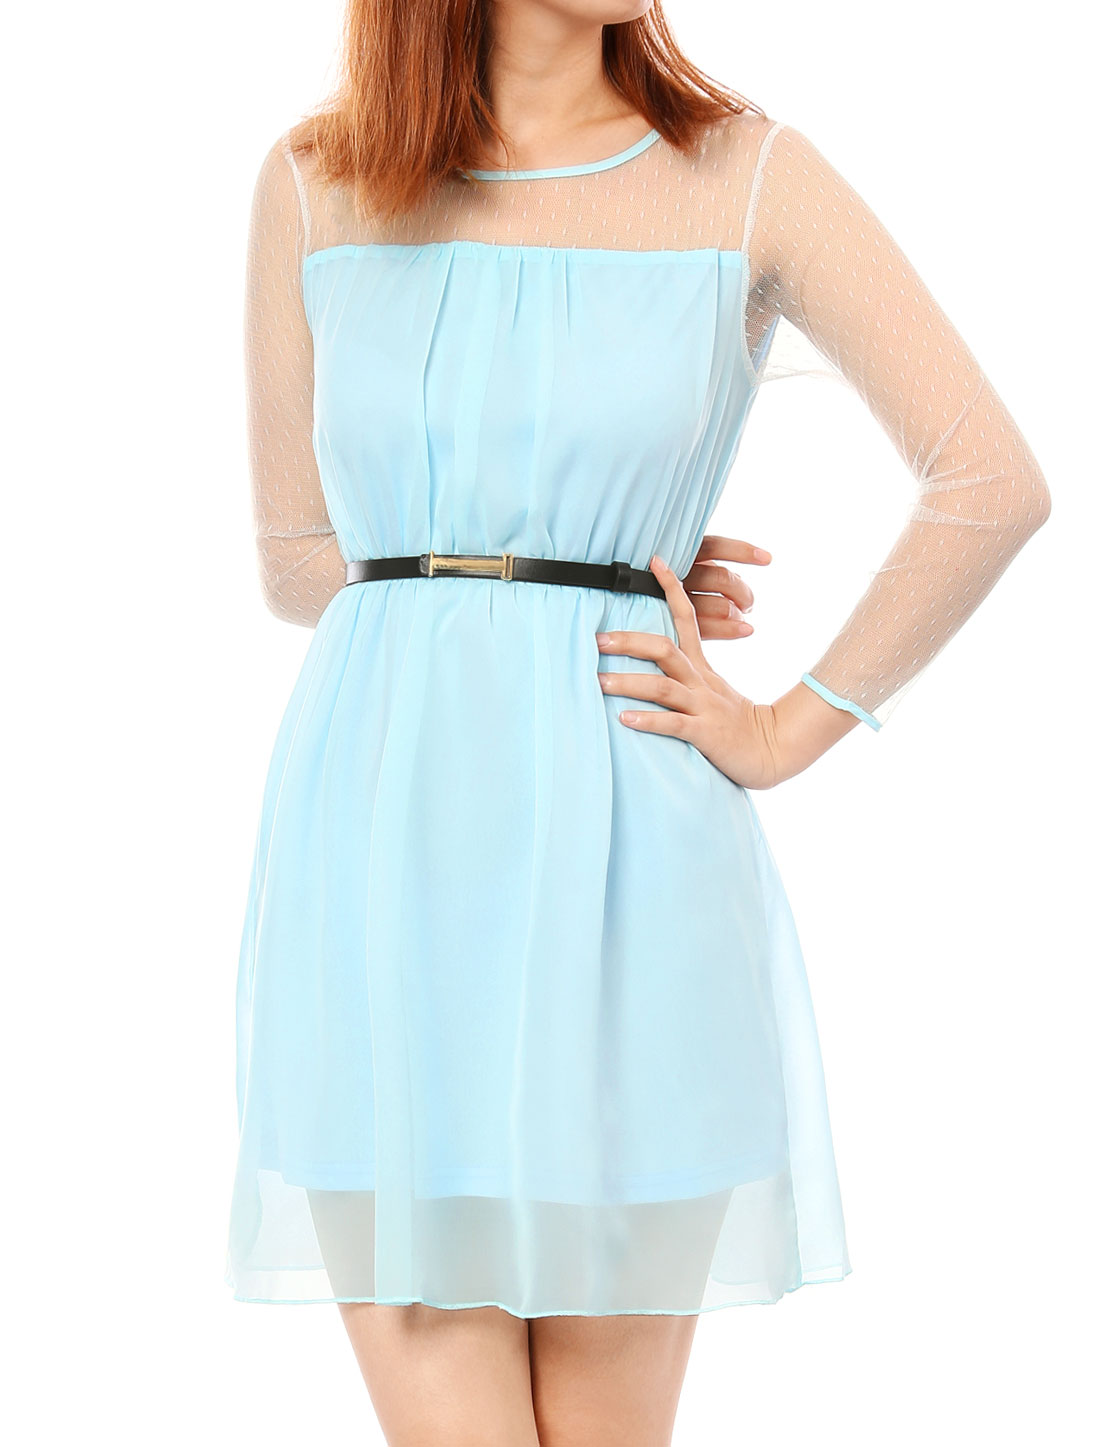 Light Blue Elastic Waist Design Lined Dress for Lady L